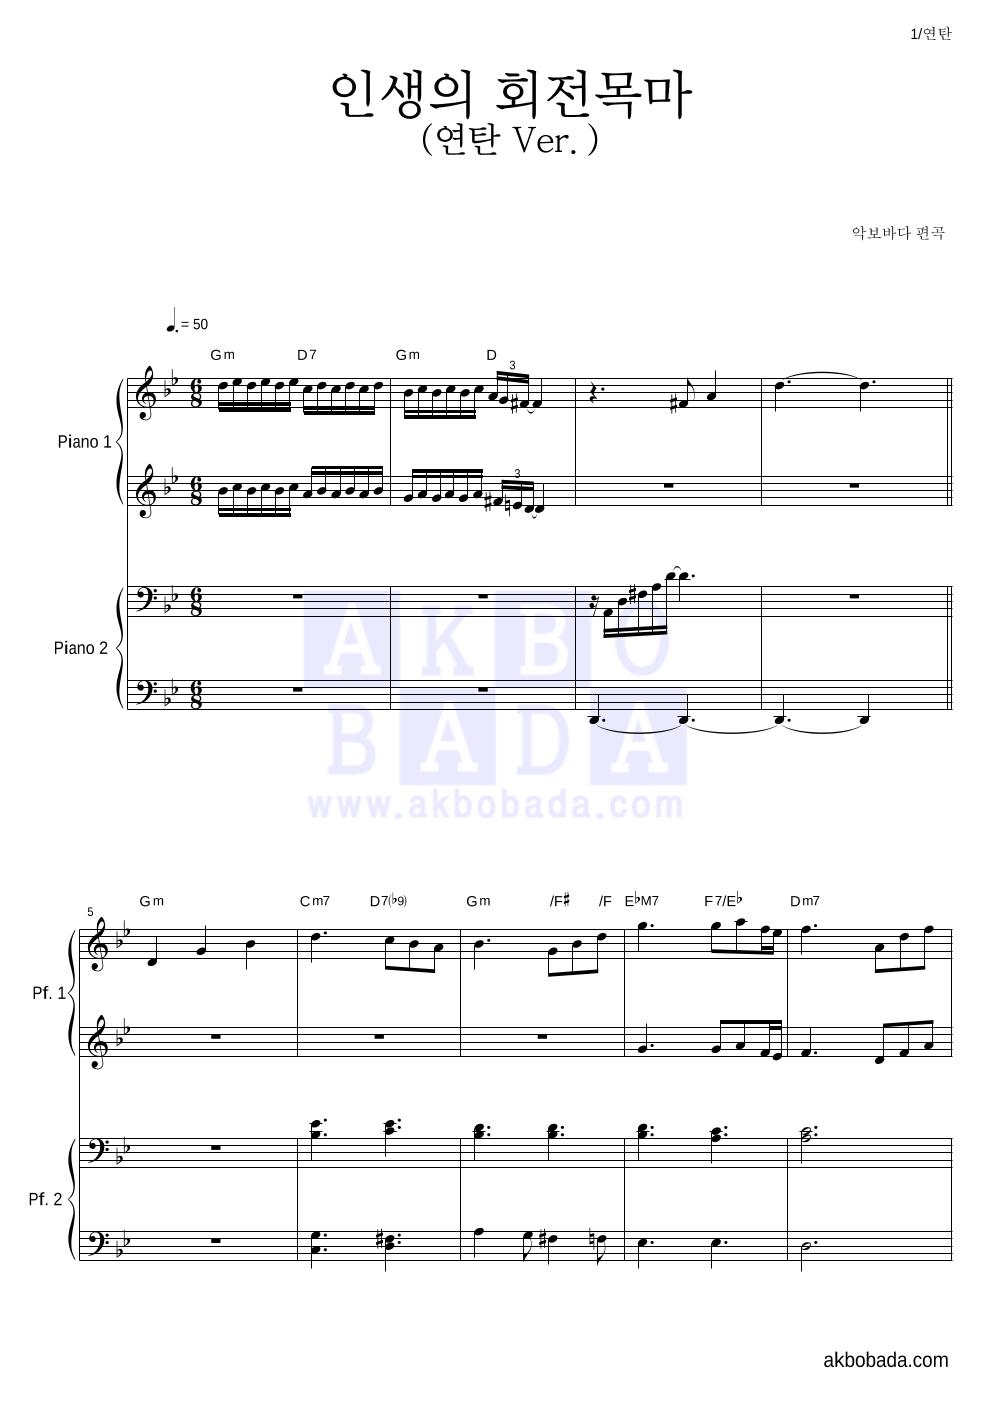 Hisaishi Joe - 인생의 회전목마 연탄곡 악보